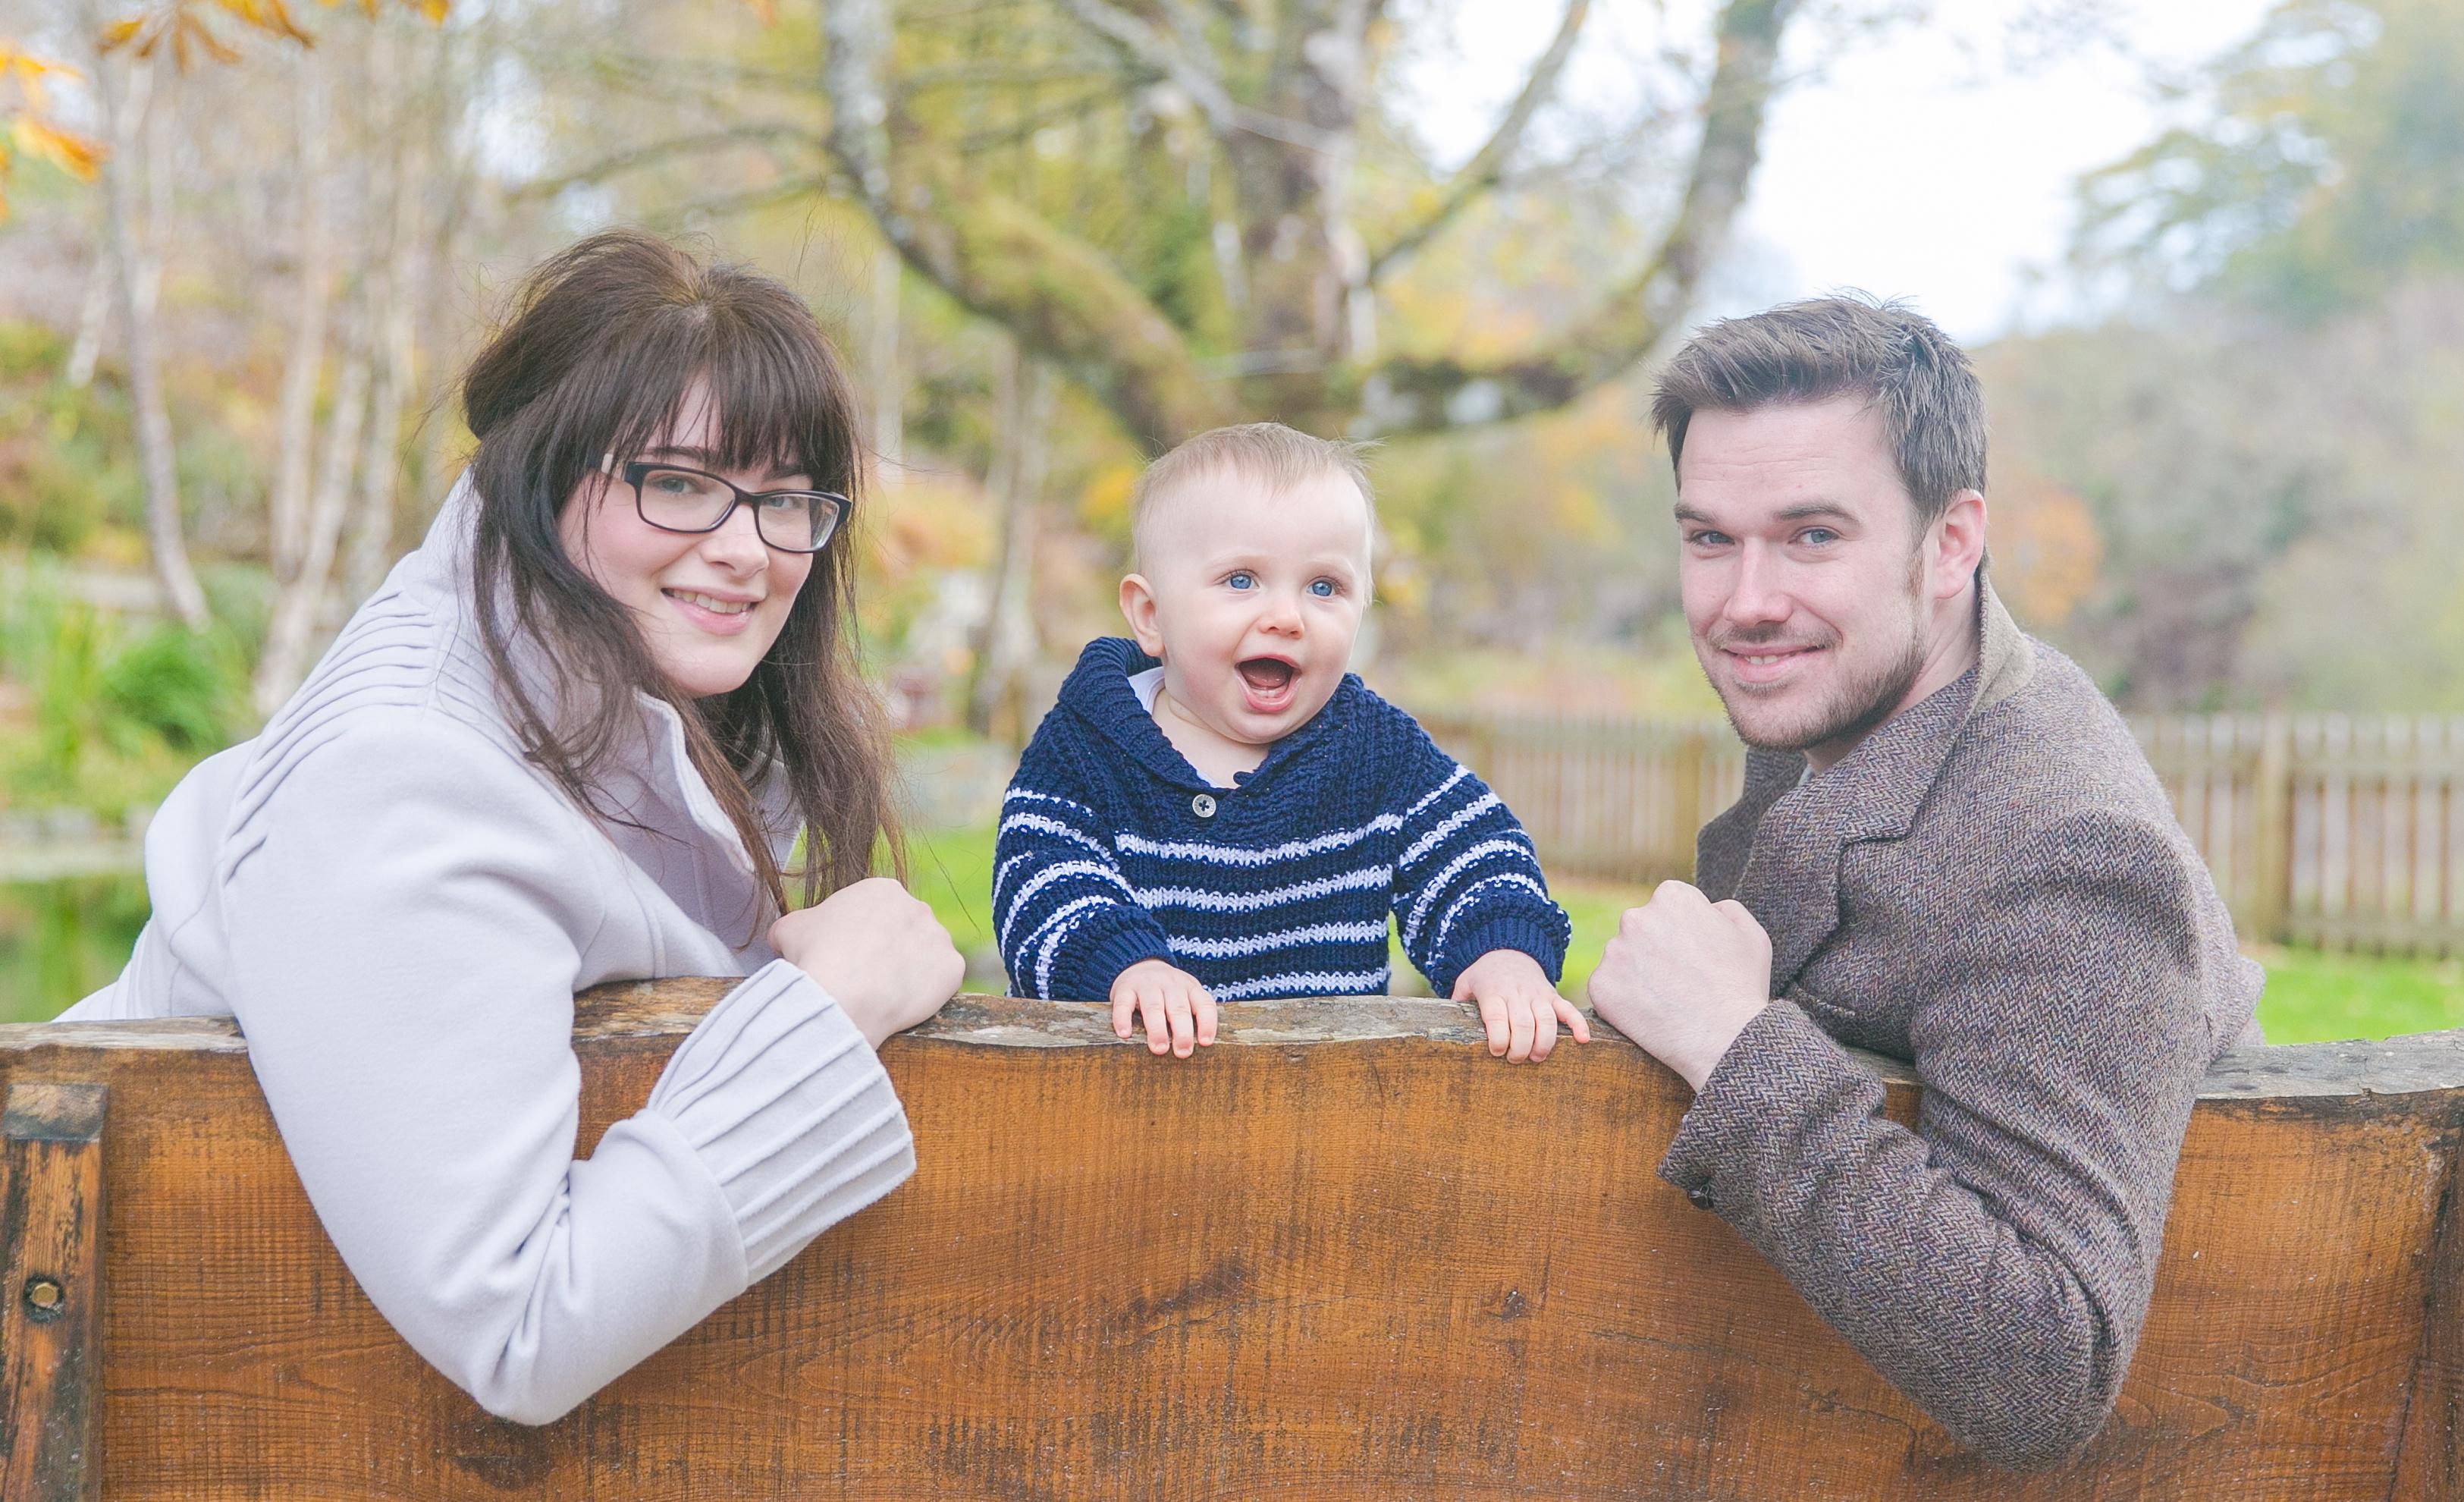 David Nicolson, his wife Victoria and their son Finlay.